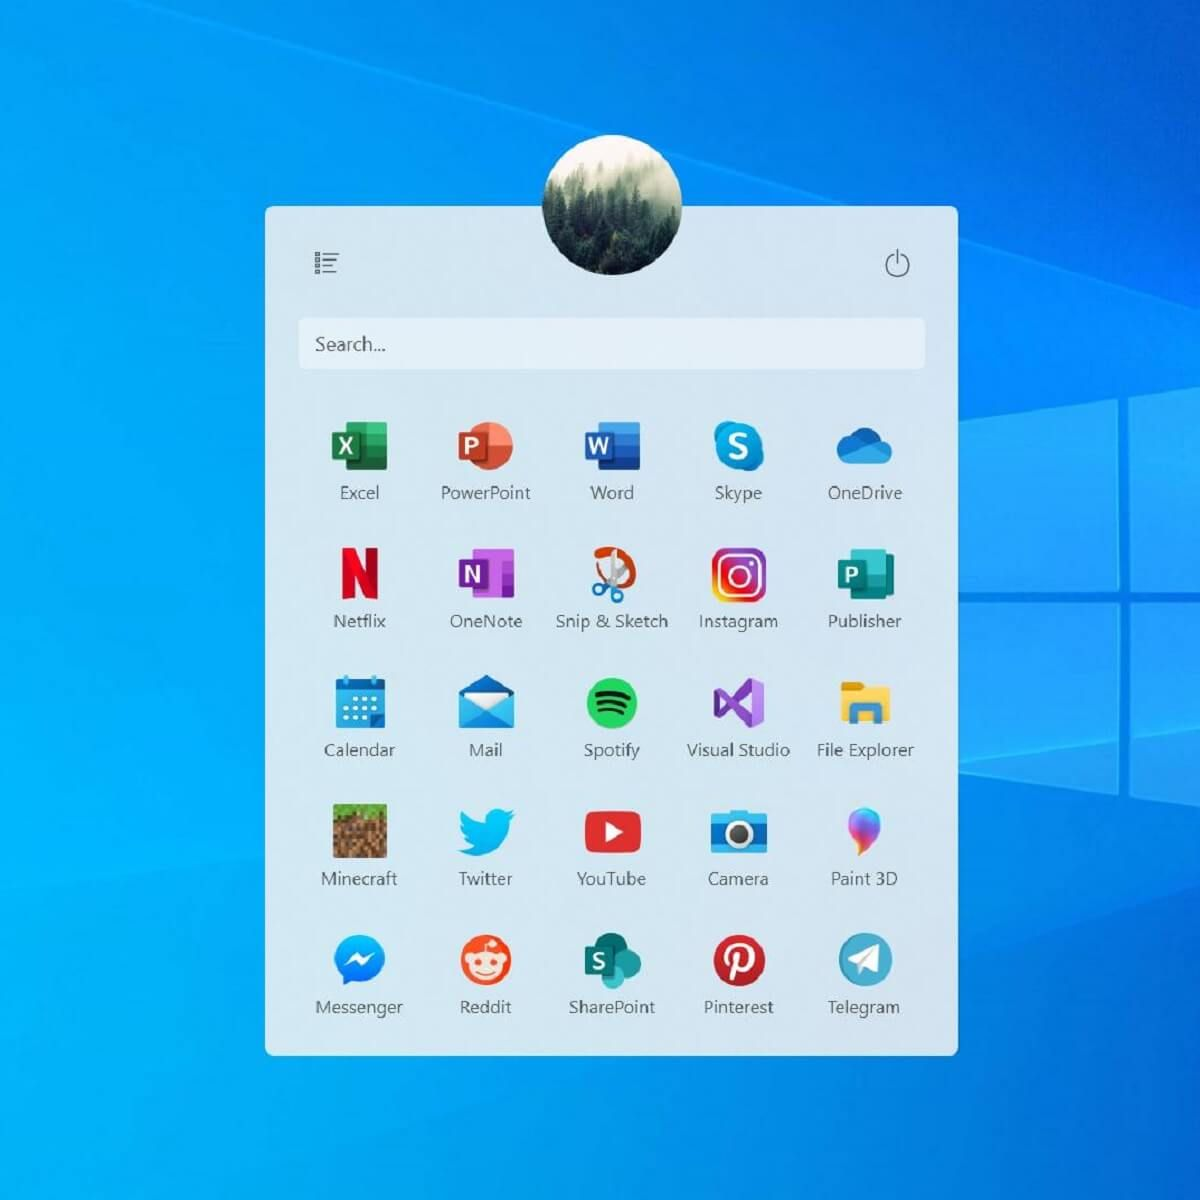 Windows 10 design guidelines